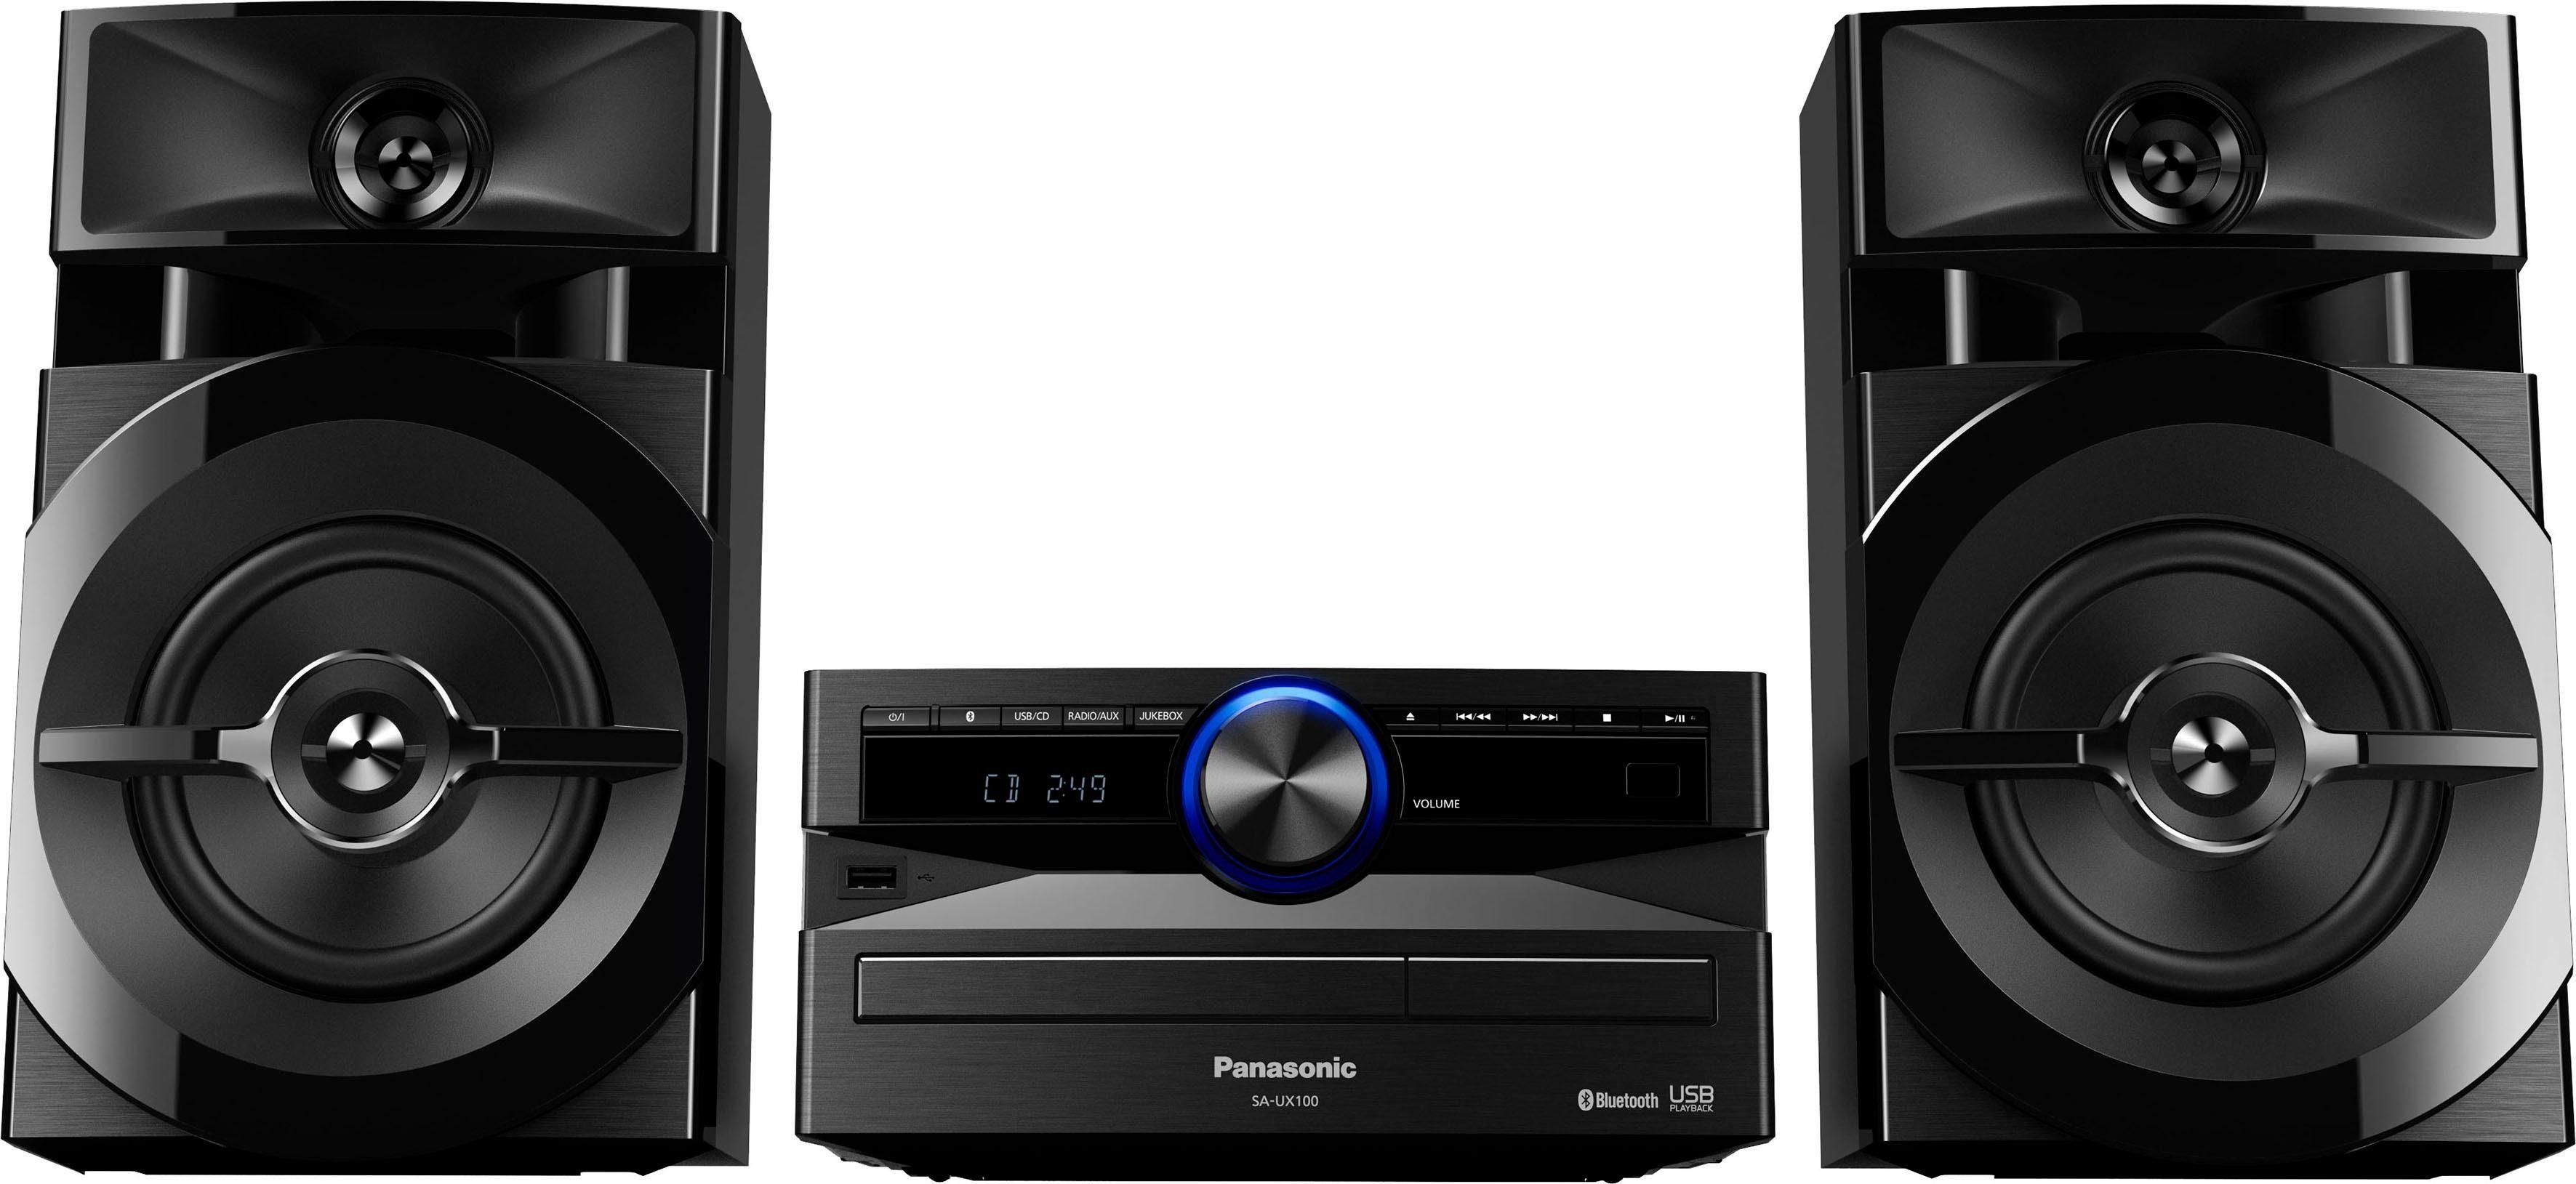 Panasonic SC-UX100 Microanlage, Juke, Bluetooth, RDS, 1x USB